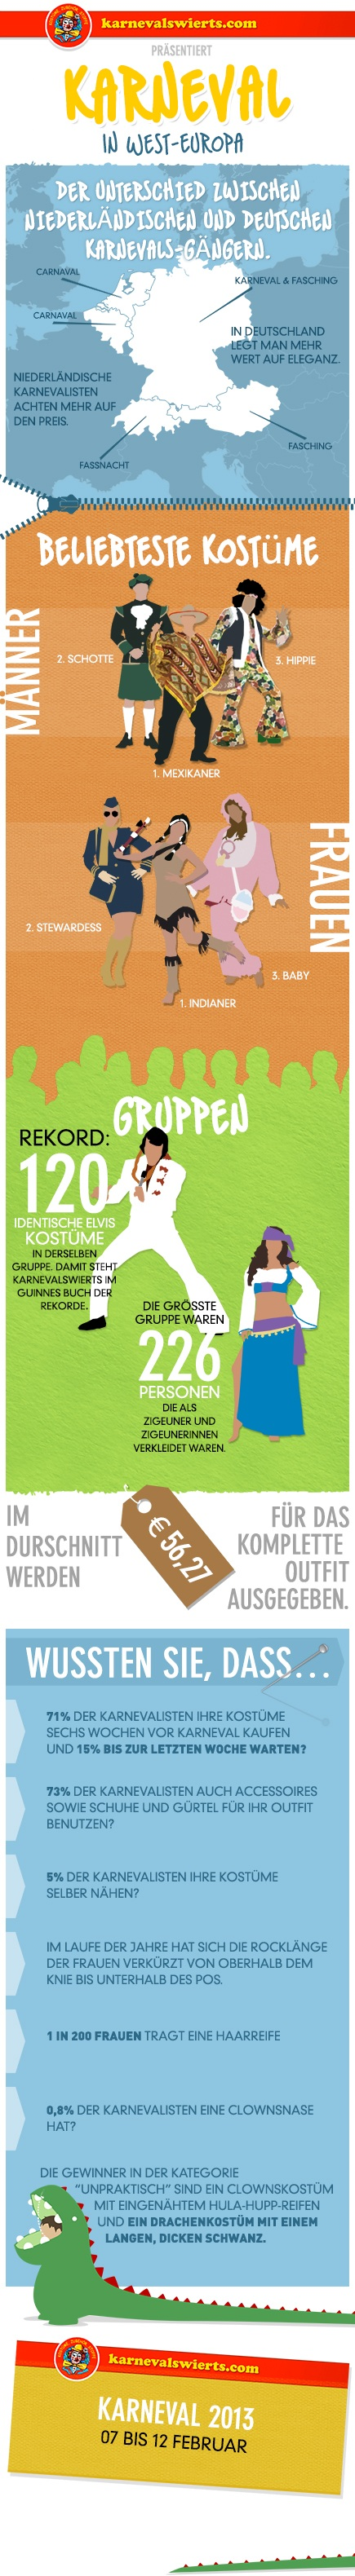 Infografik Karnevalswierts.com